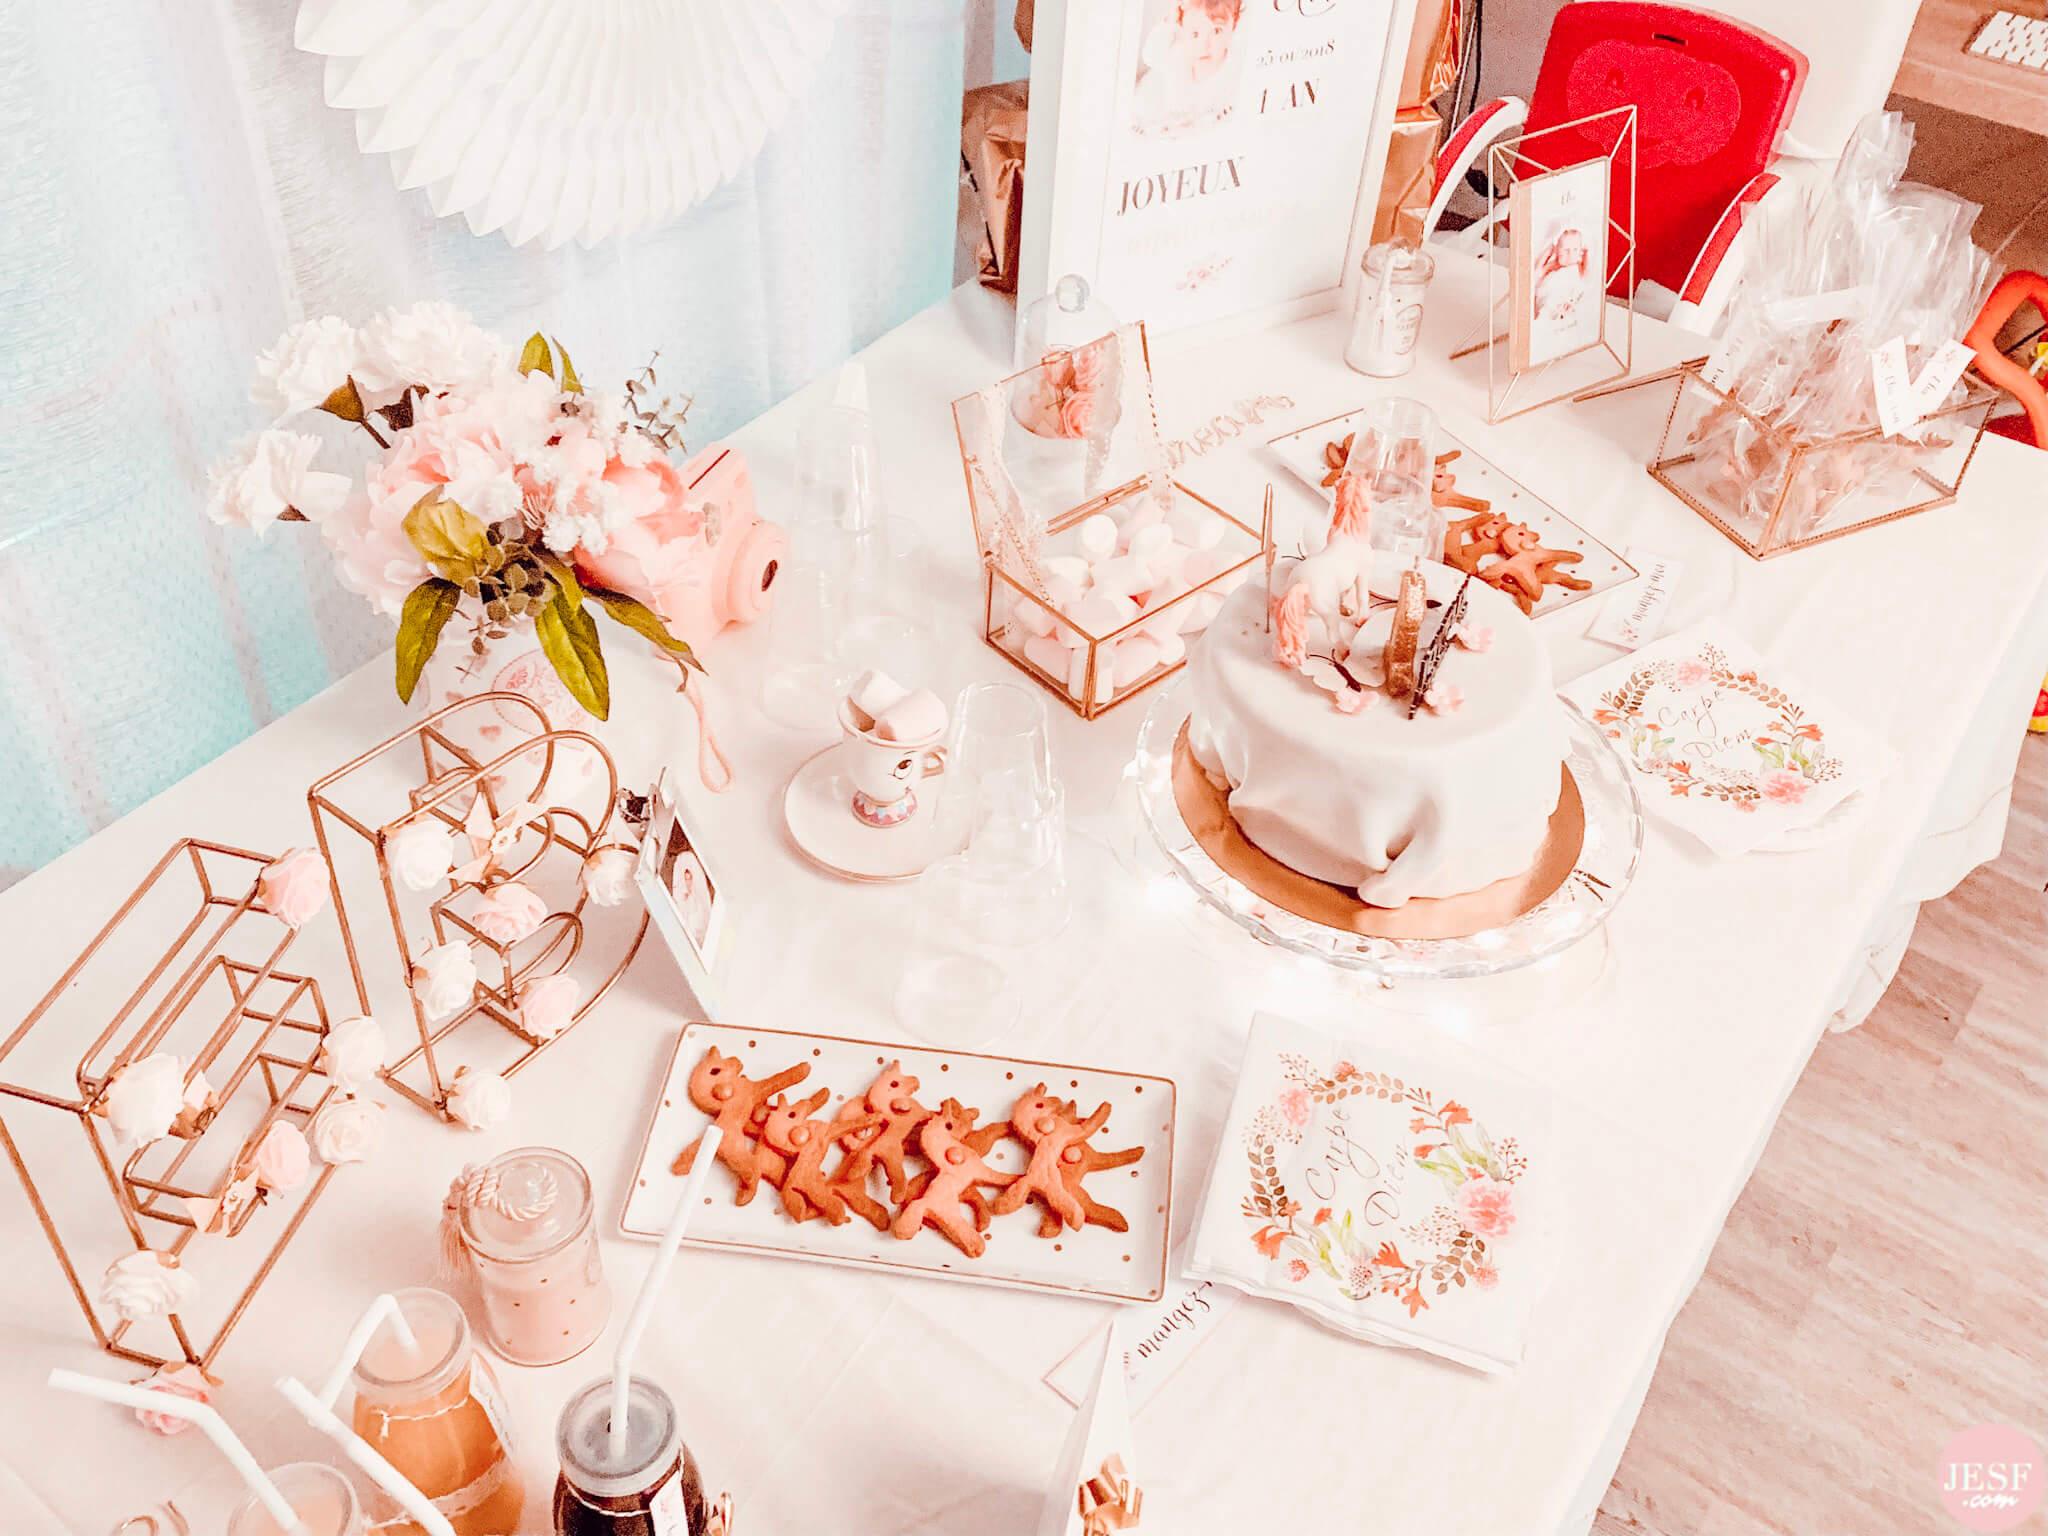 fête-anniversaire-sweet-table-petite-fille-1-an-girly-rose-ideés